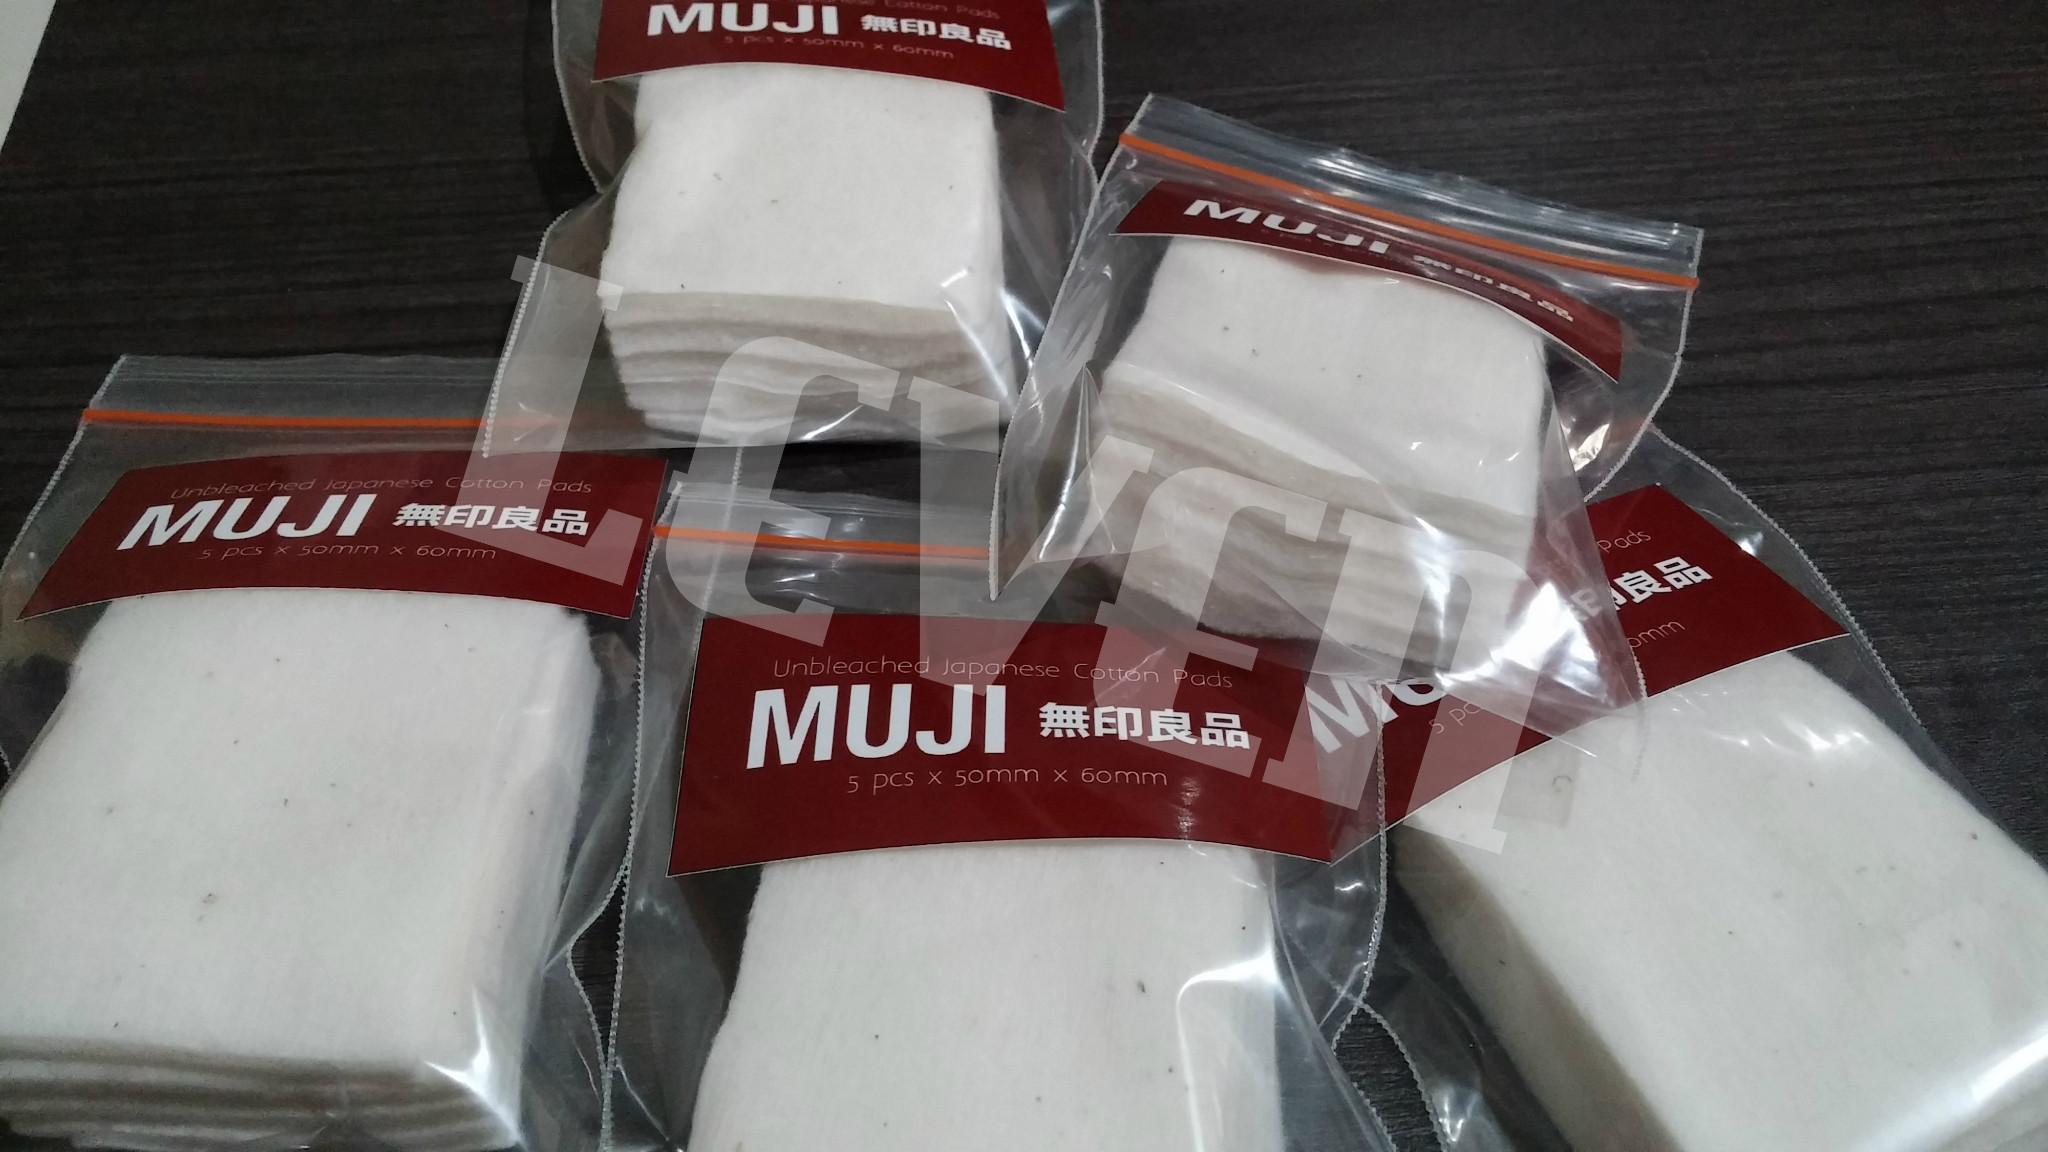 Kapas Muji Cotton 10pad Organic Daftar Harga Terlengkap Jepang Authentic Original Organik Impor Ecru Vape Vapor Japan Japanese Jual